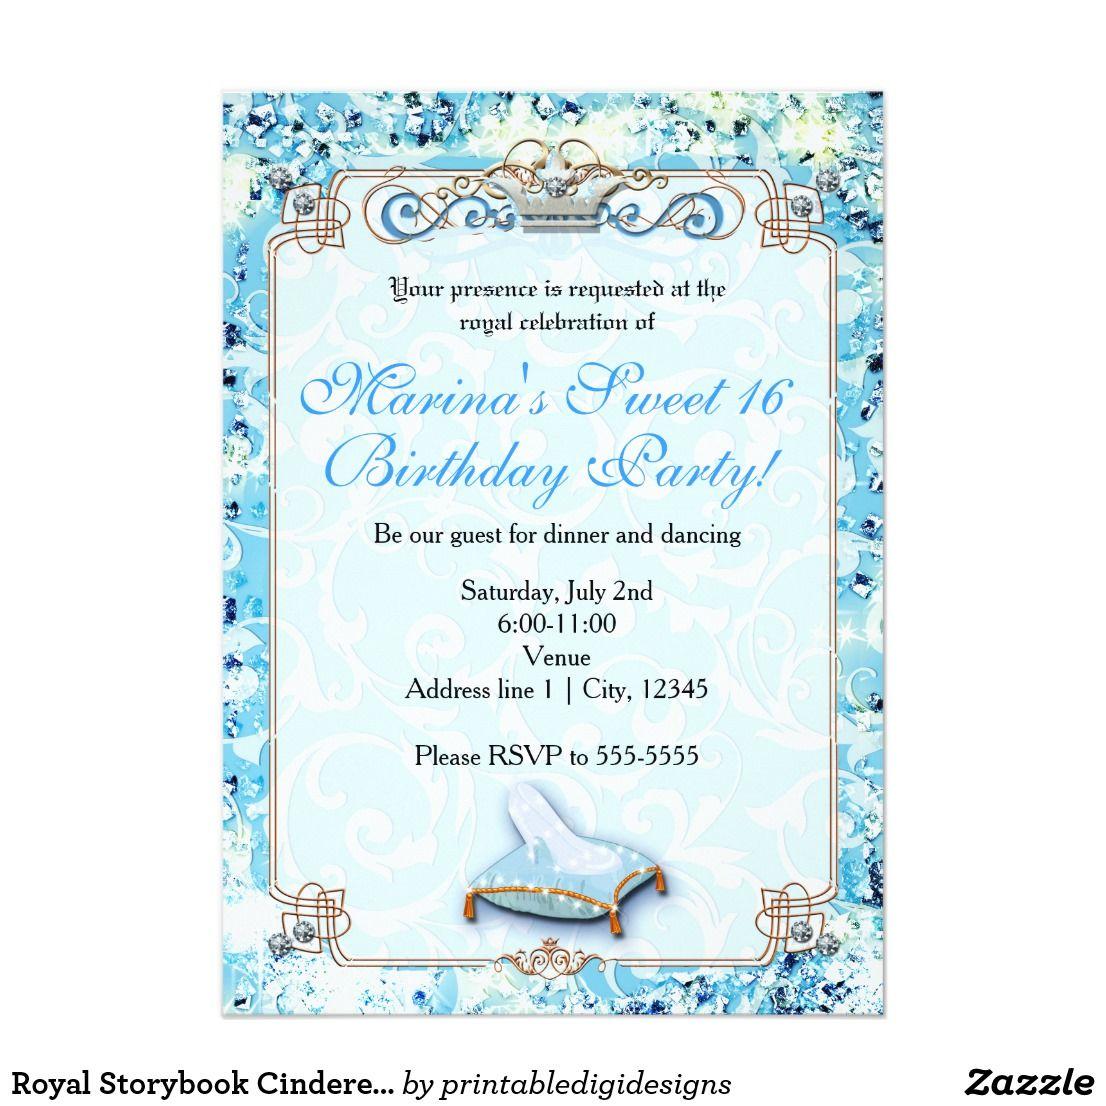 Royal Storybook Cinderella Sweet 16 Invitation Zazzle Com In 2019